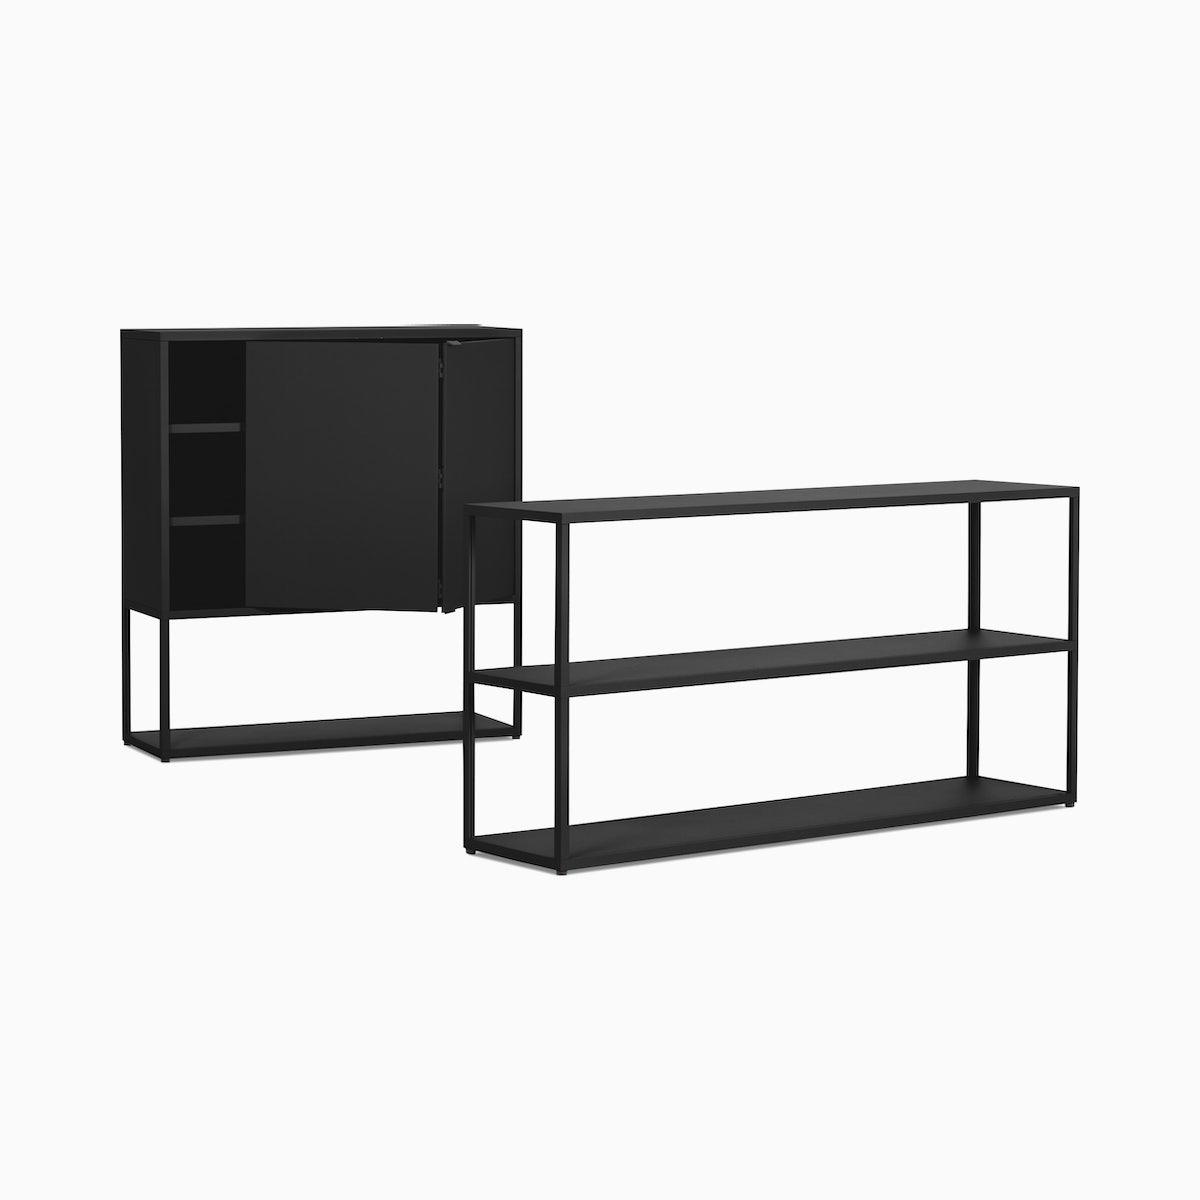 New Order Set – Low Wide Bookshelf + Cabinet